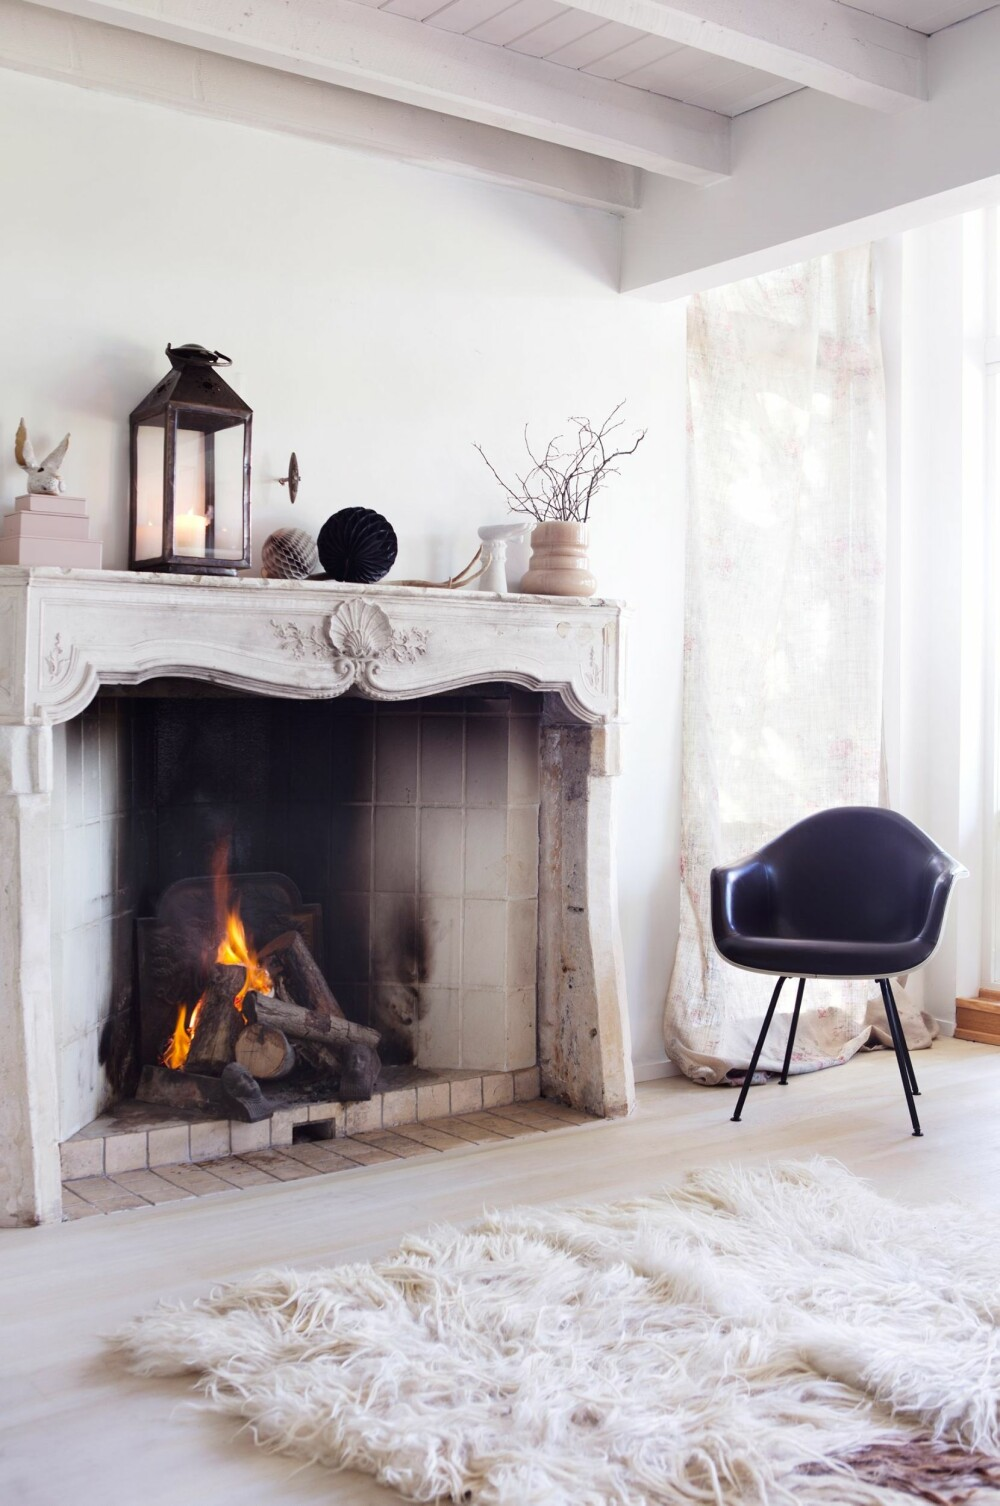 FRANSK STIL: Interiørstylist Tone Kroken har valgt et stort ildsted med vakre ornamenter.